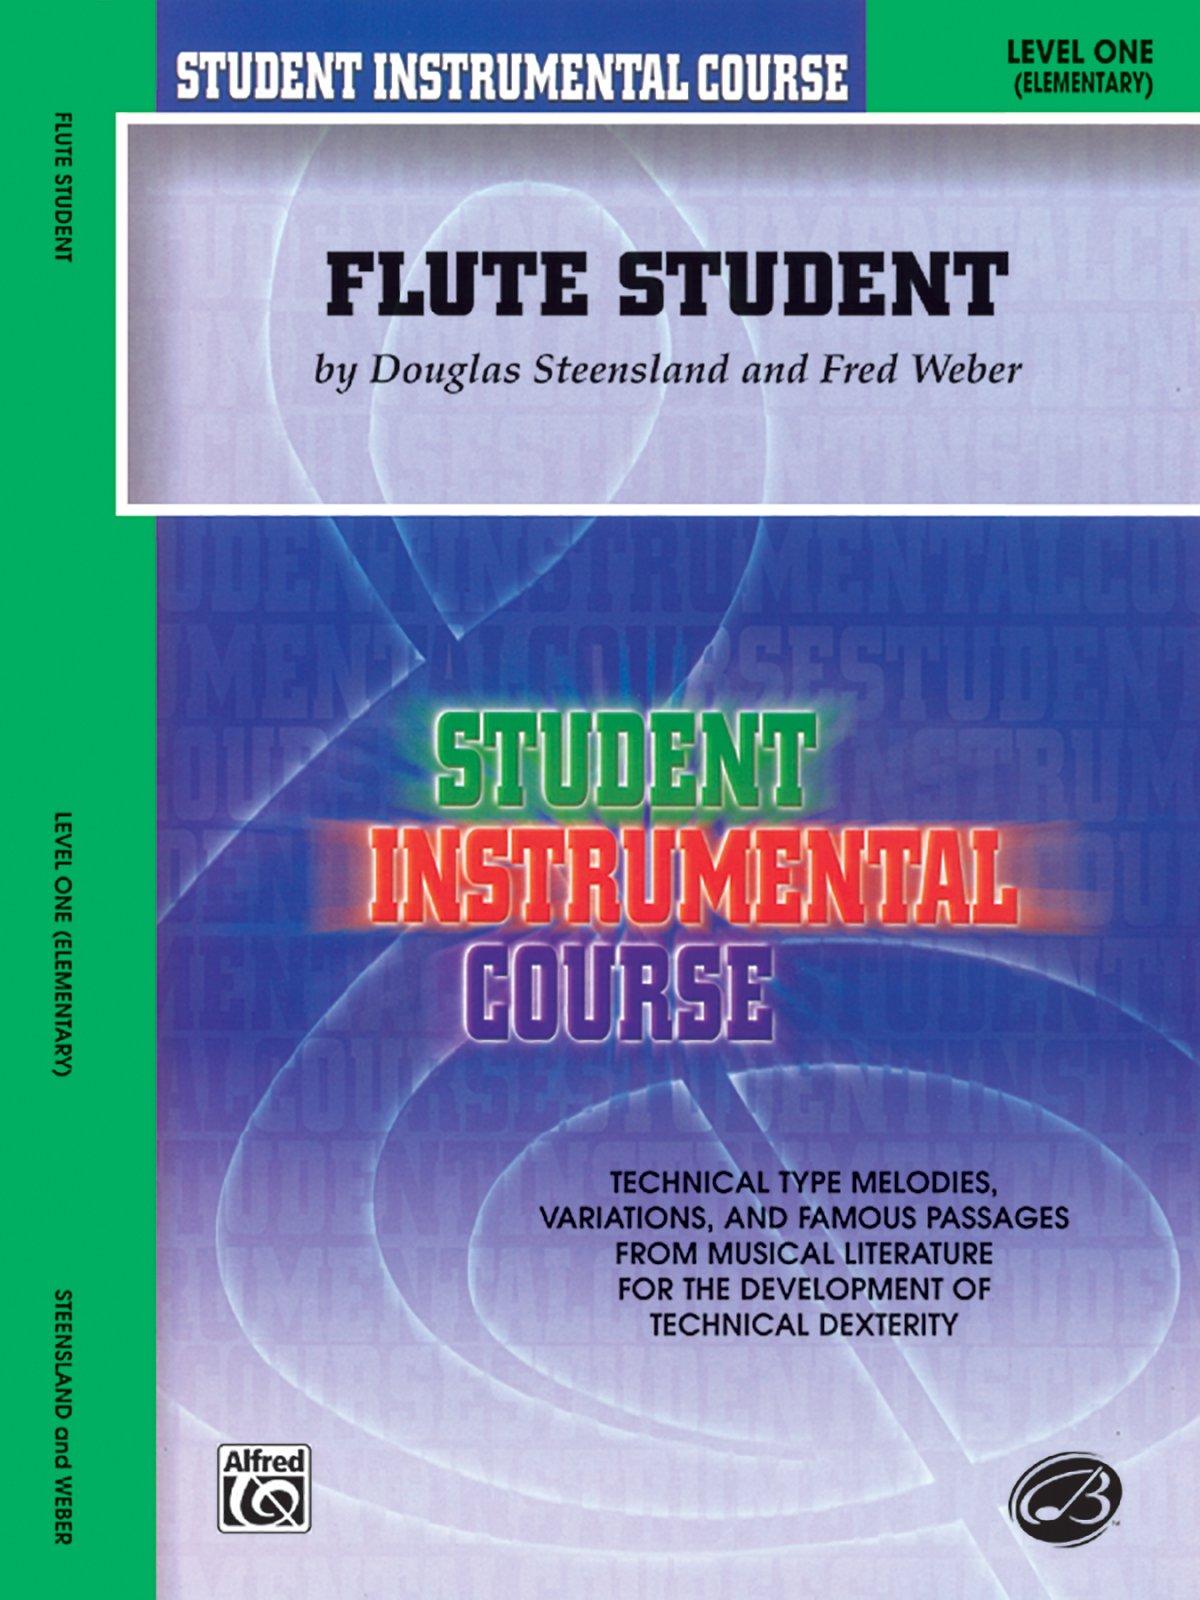 Student Instrumental Course Flute Student: Level I